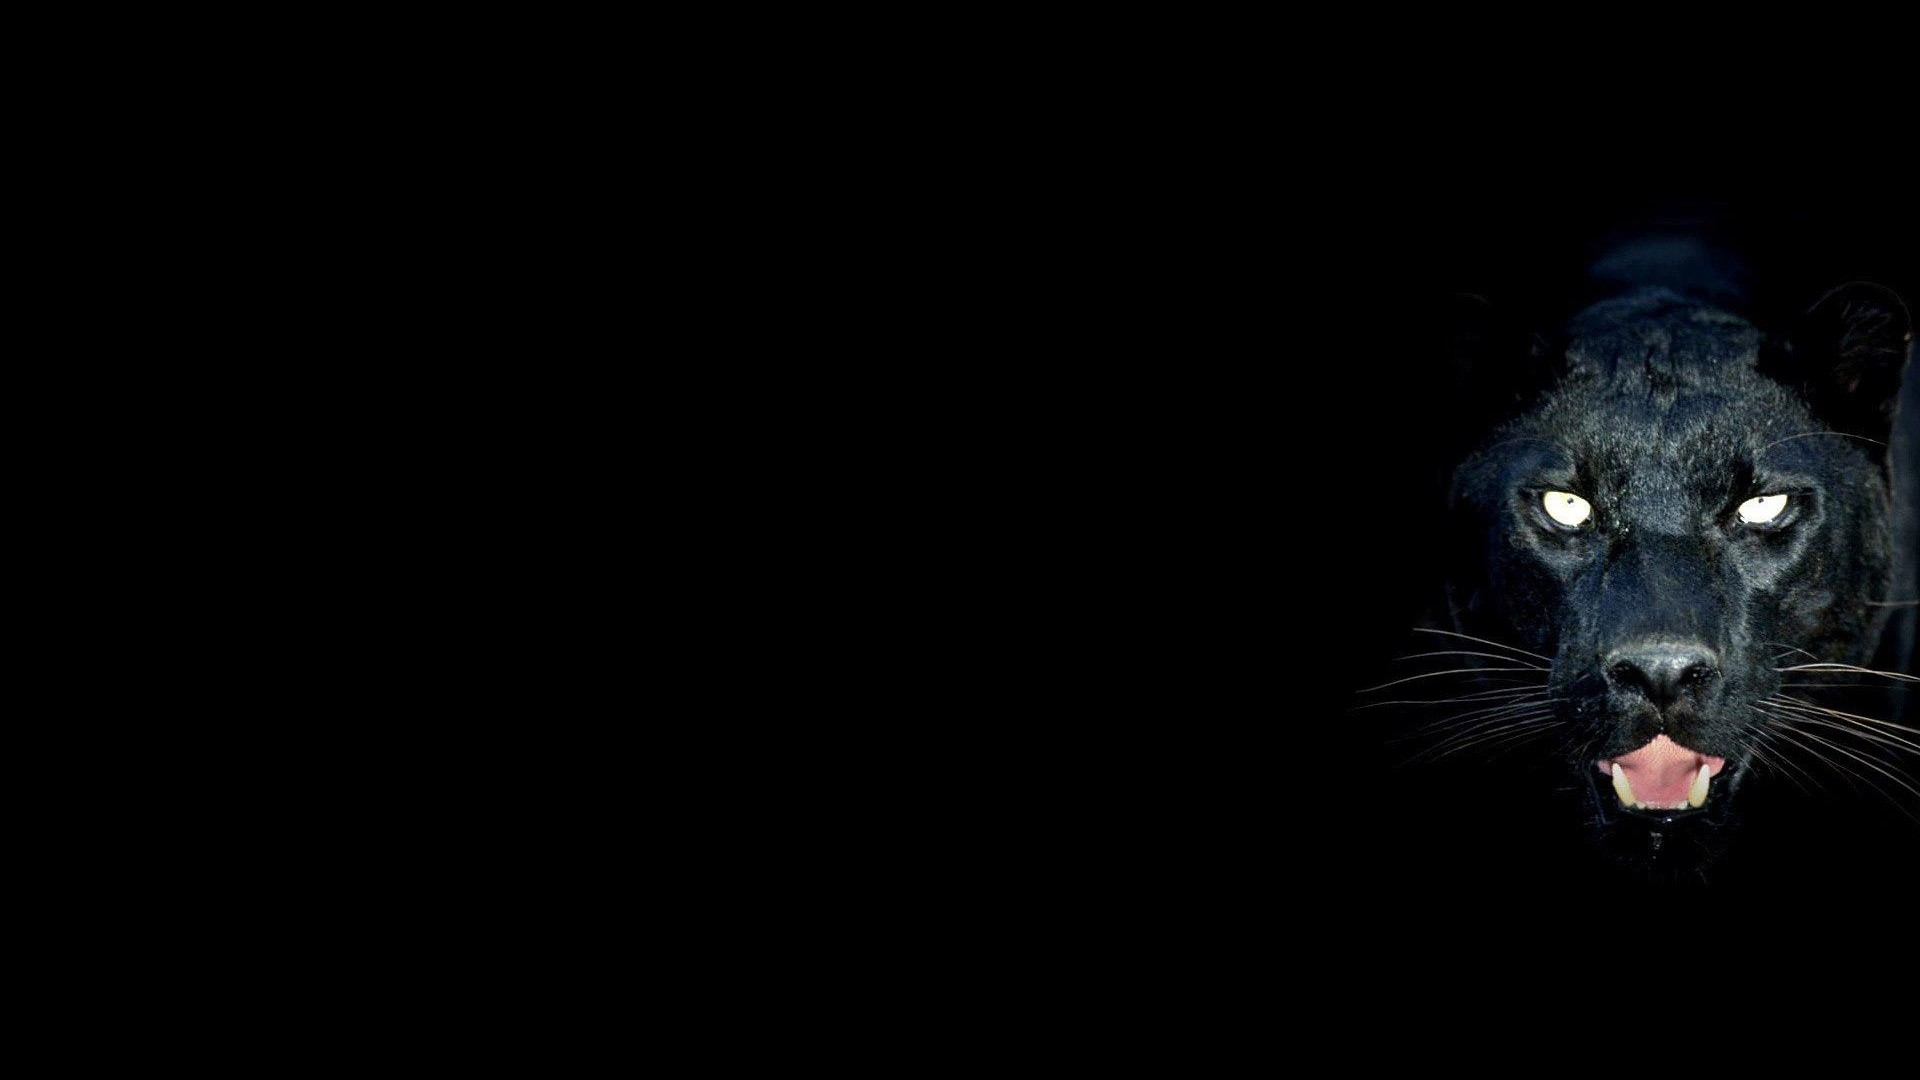 1920x1080 Black Panther Wallpaper With Blue Eyes Panther Wallpaper 1920x1080